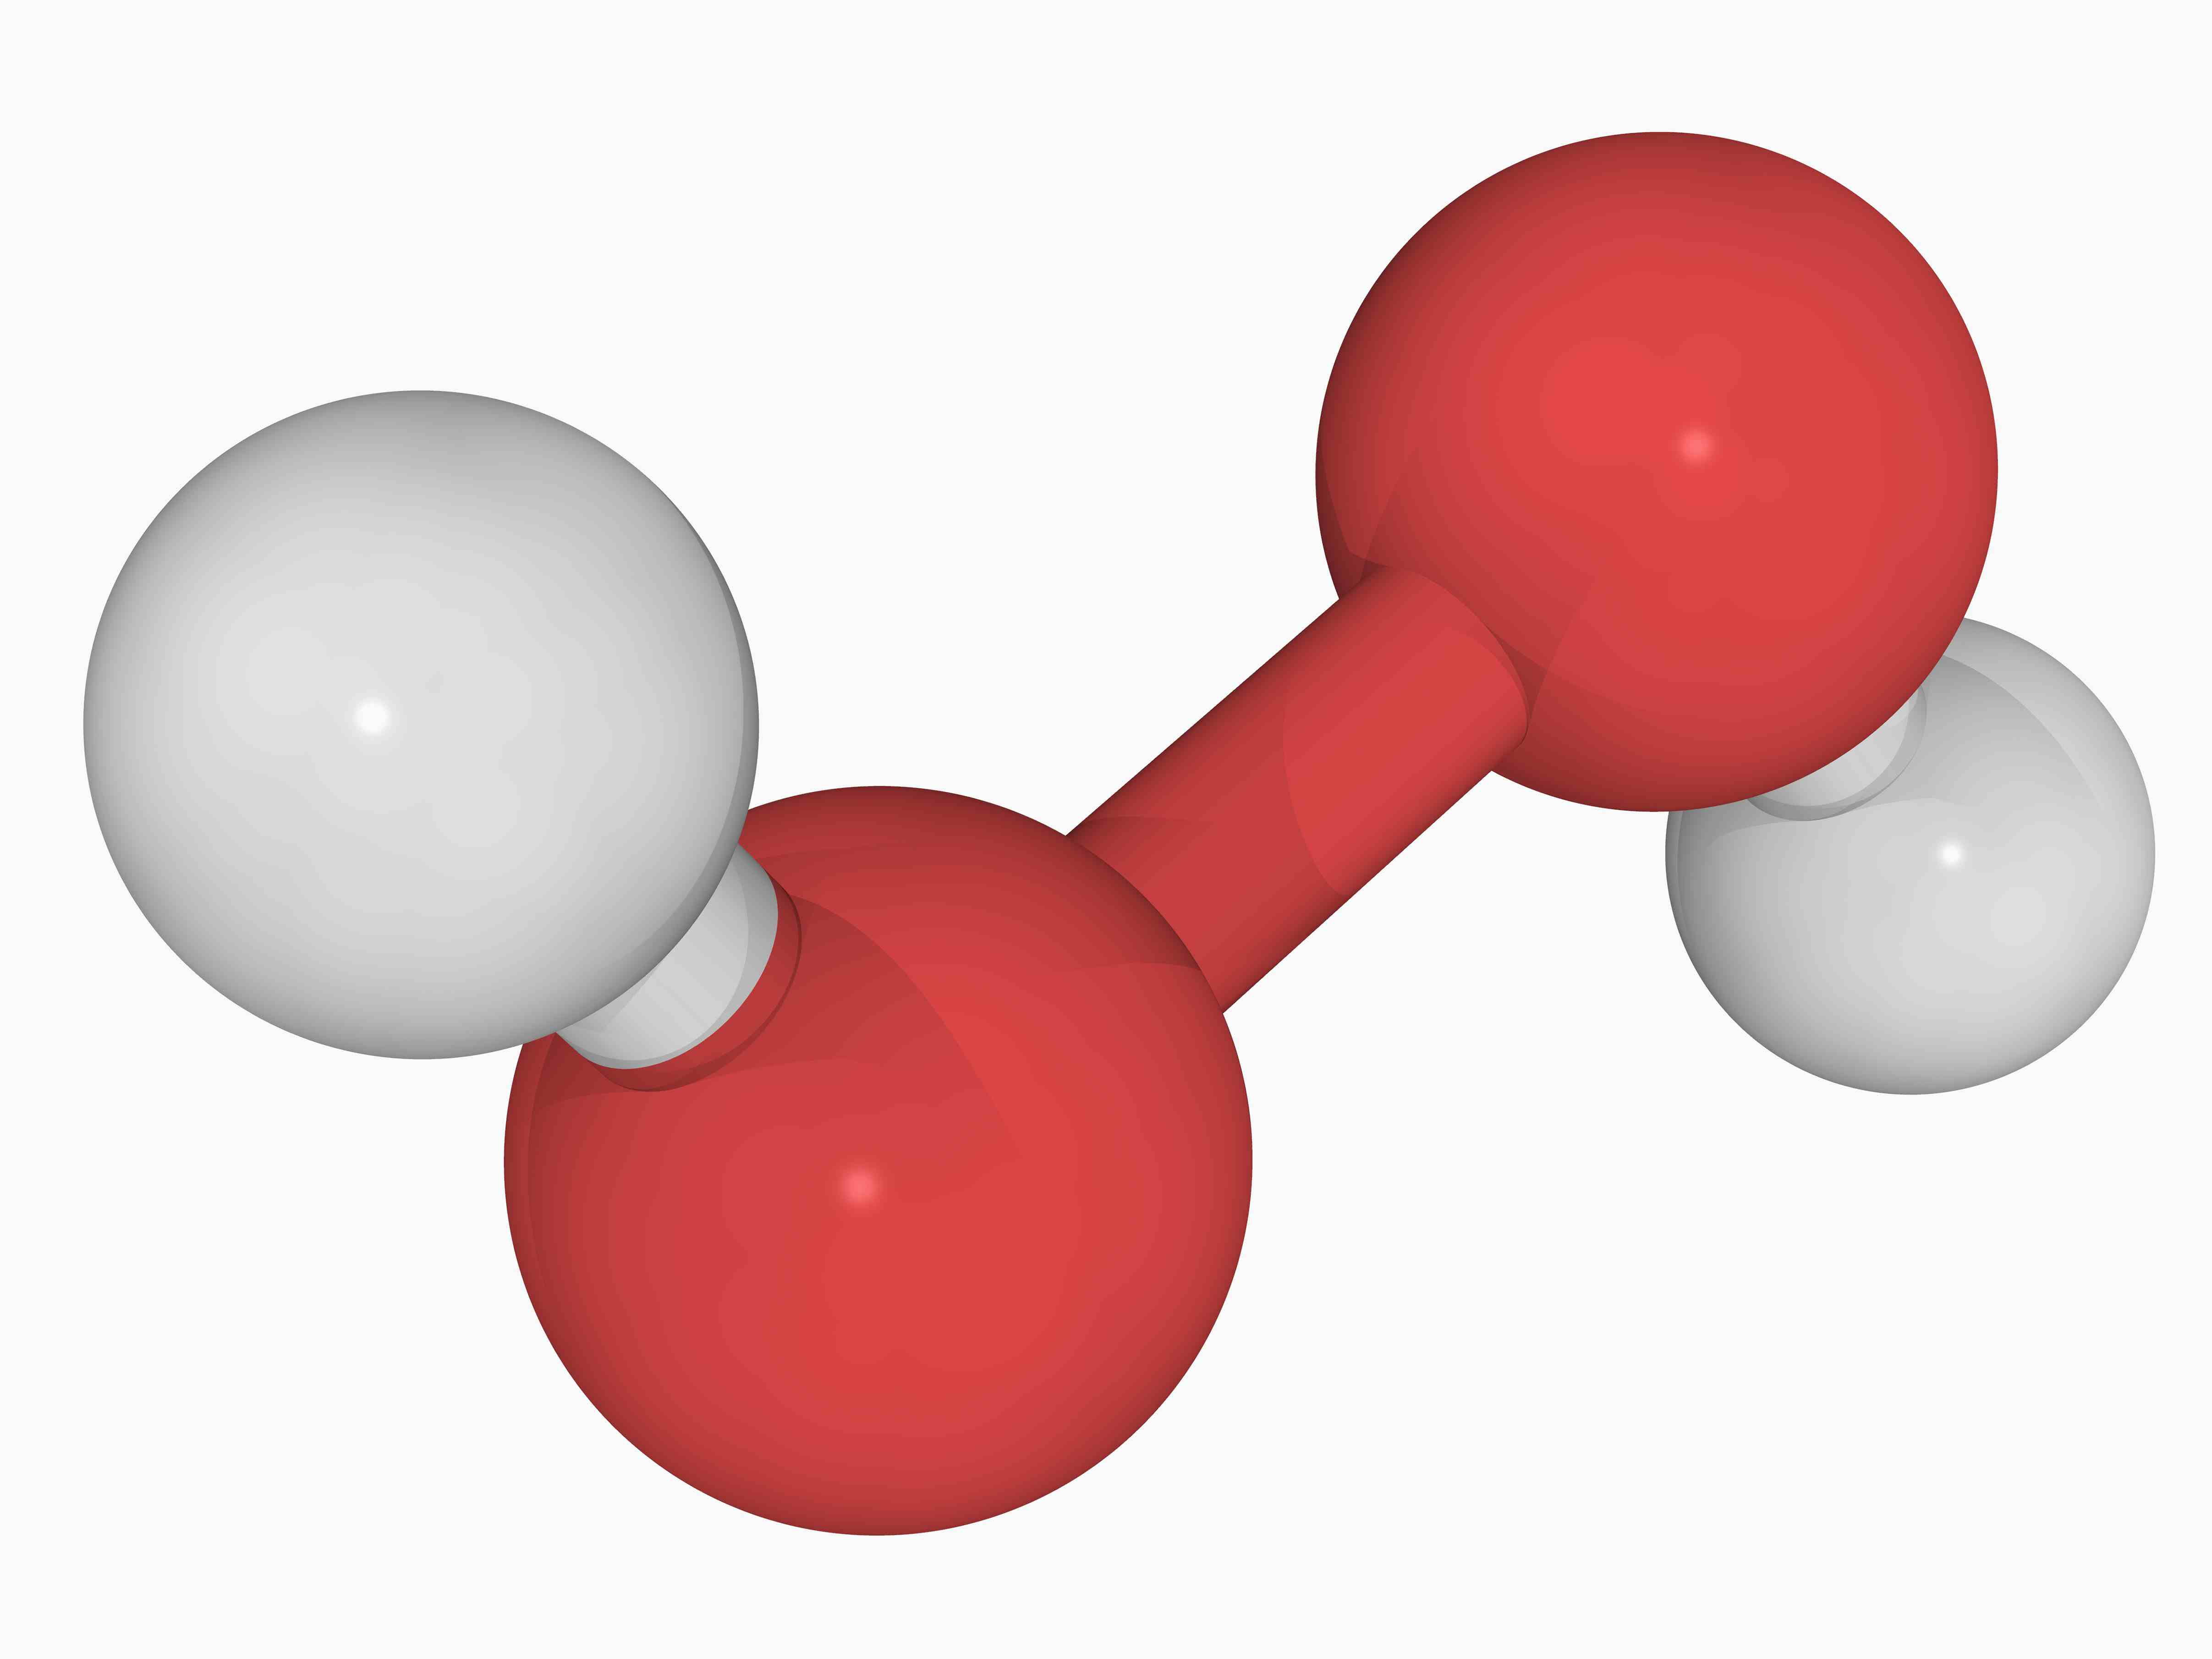 10 Dangerous Chemicals You Should Avoid